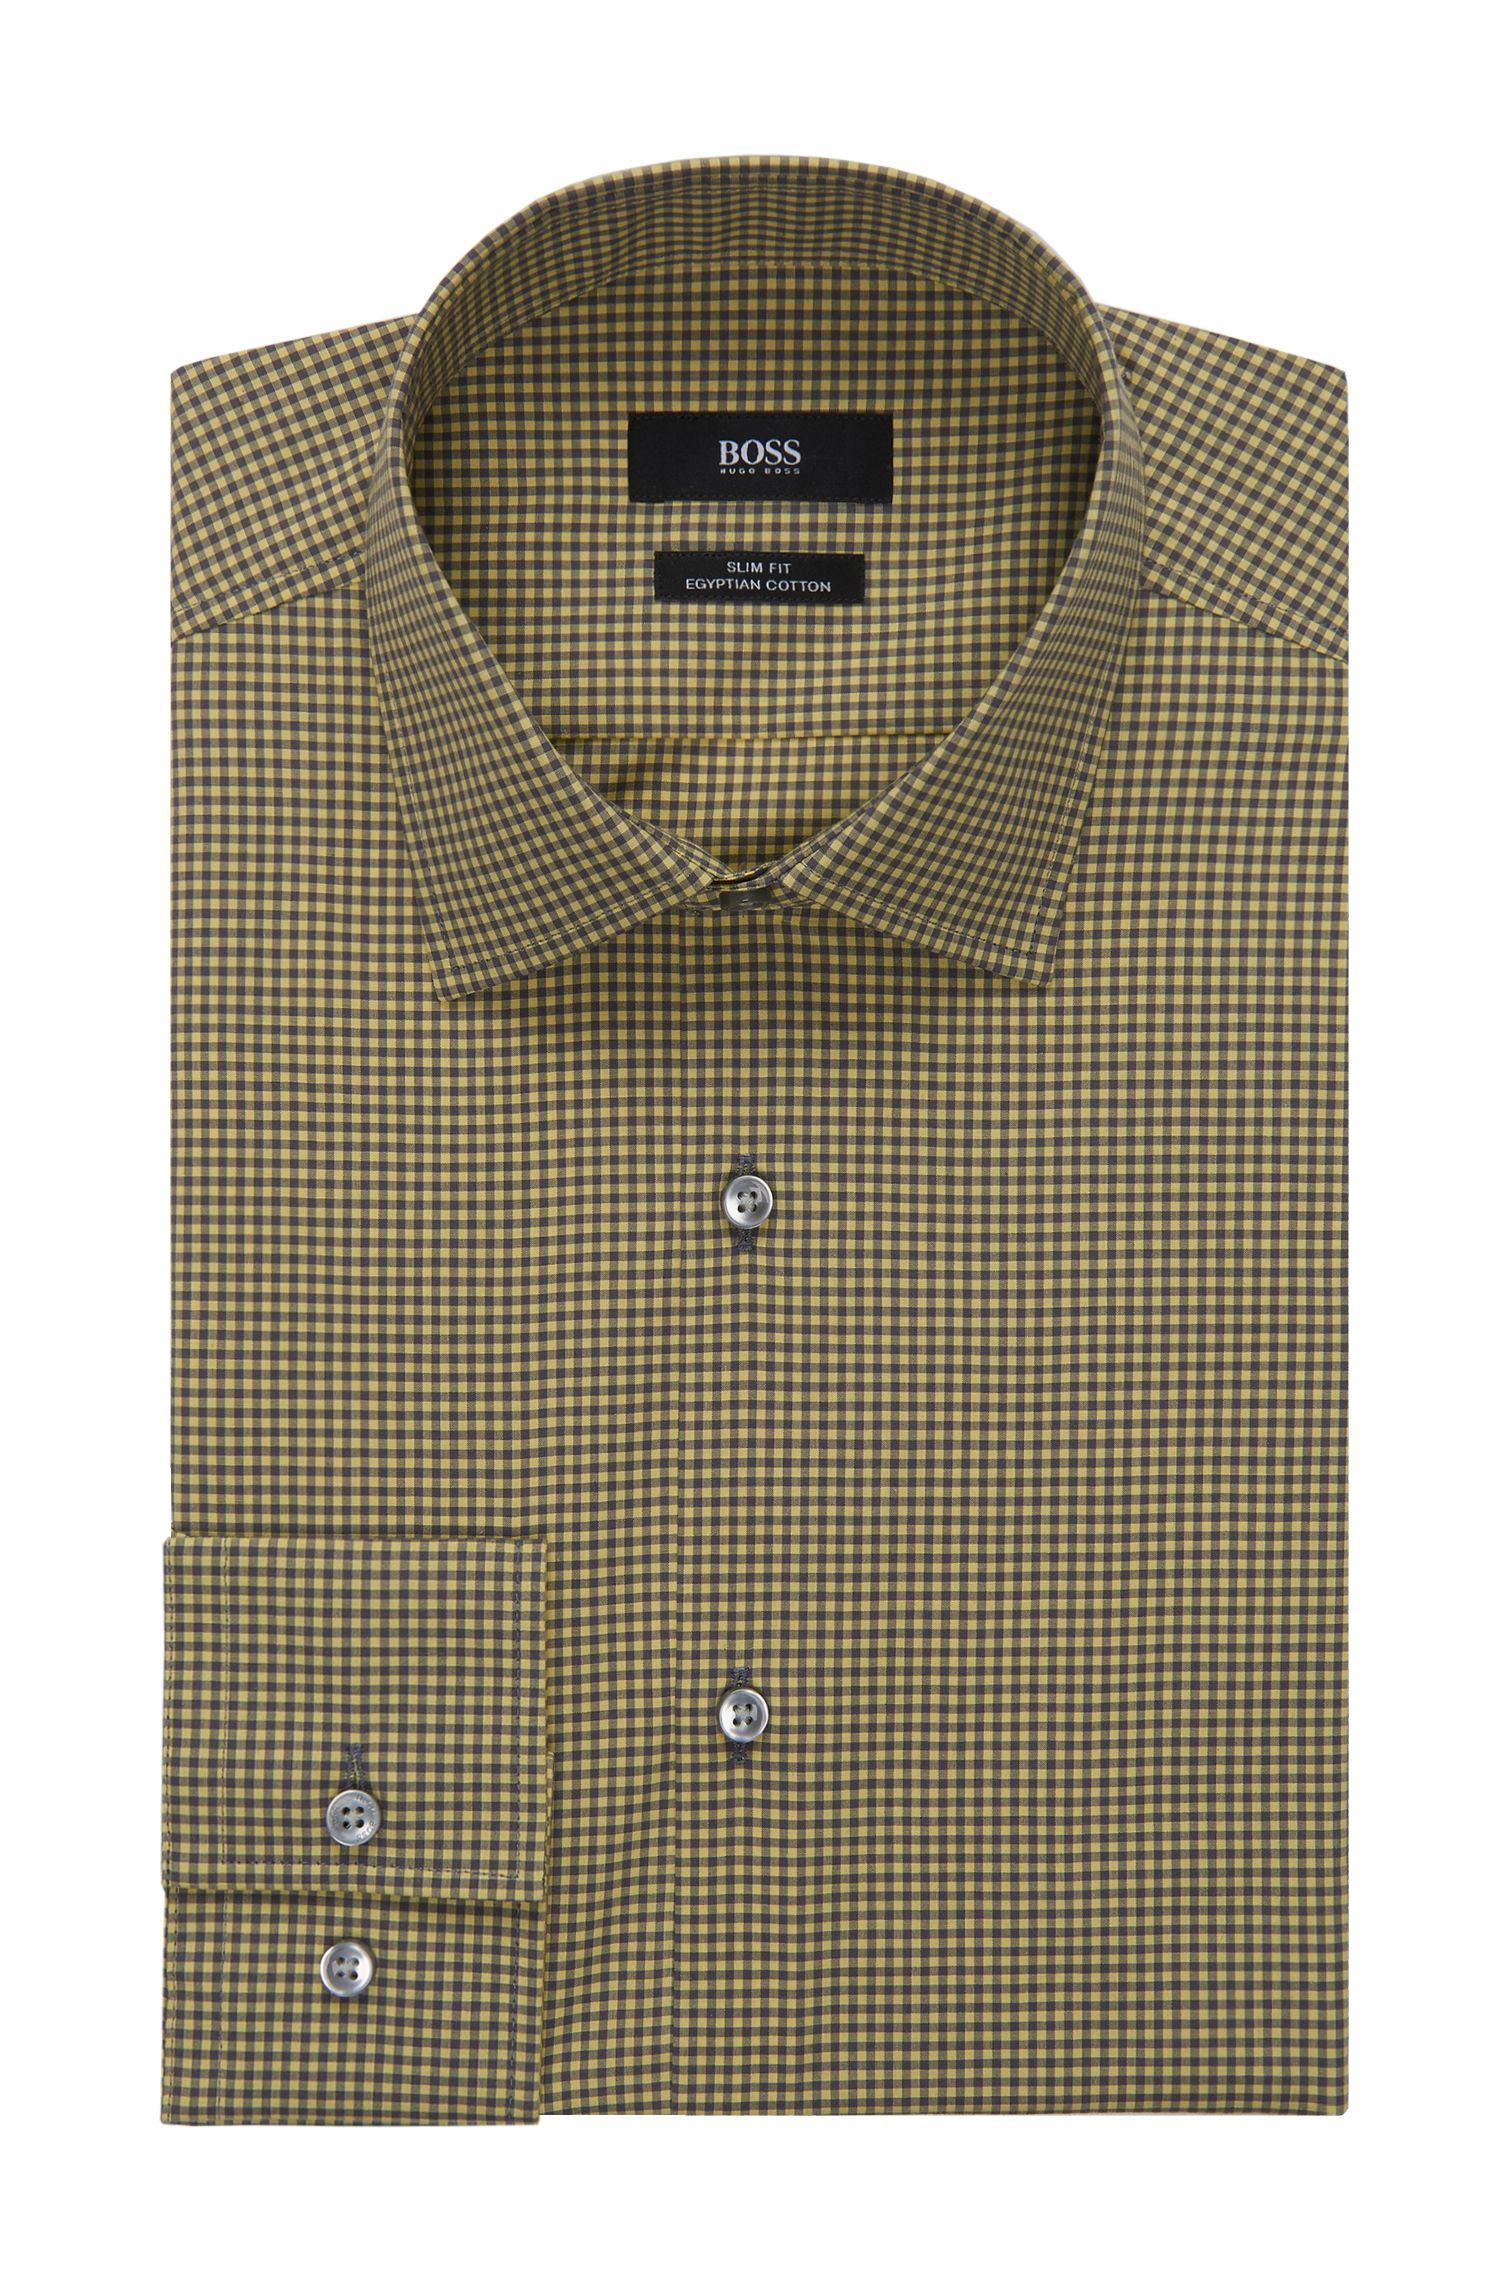 Gingham Egyptian Cotton Dress Shirt, Slim Fit | Jenno